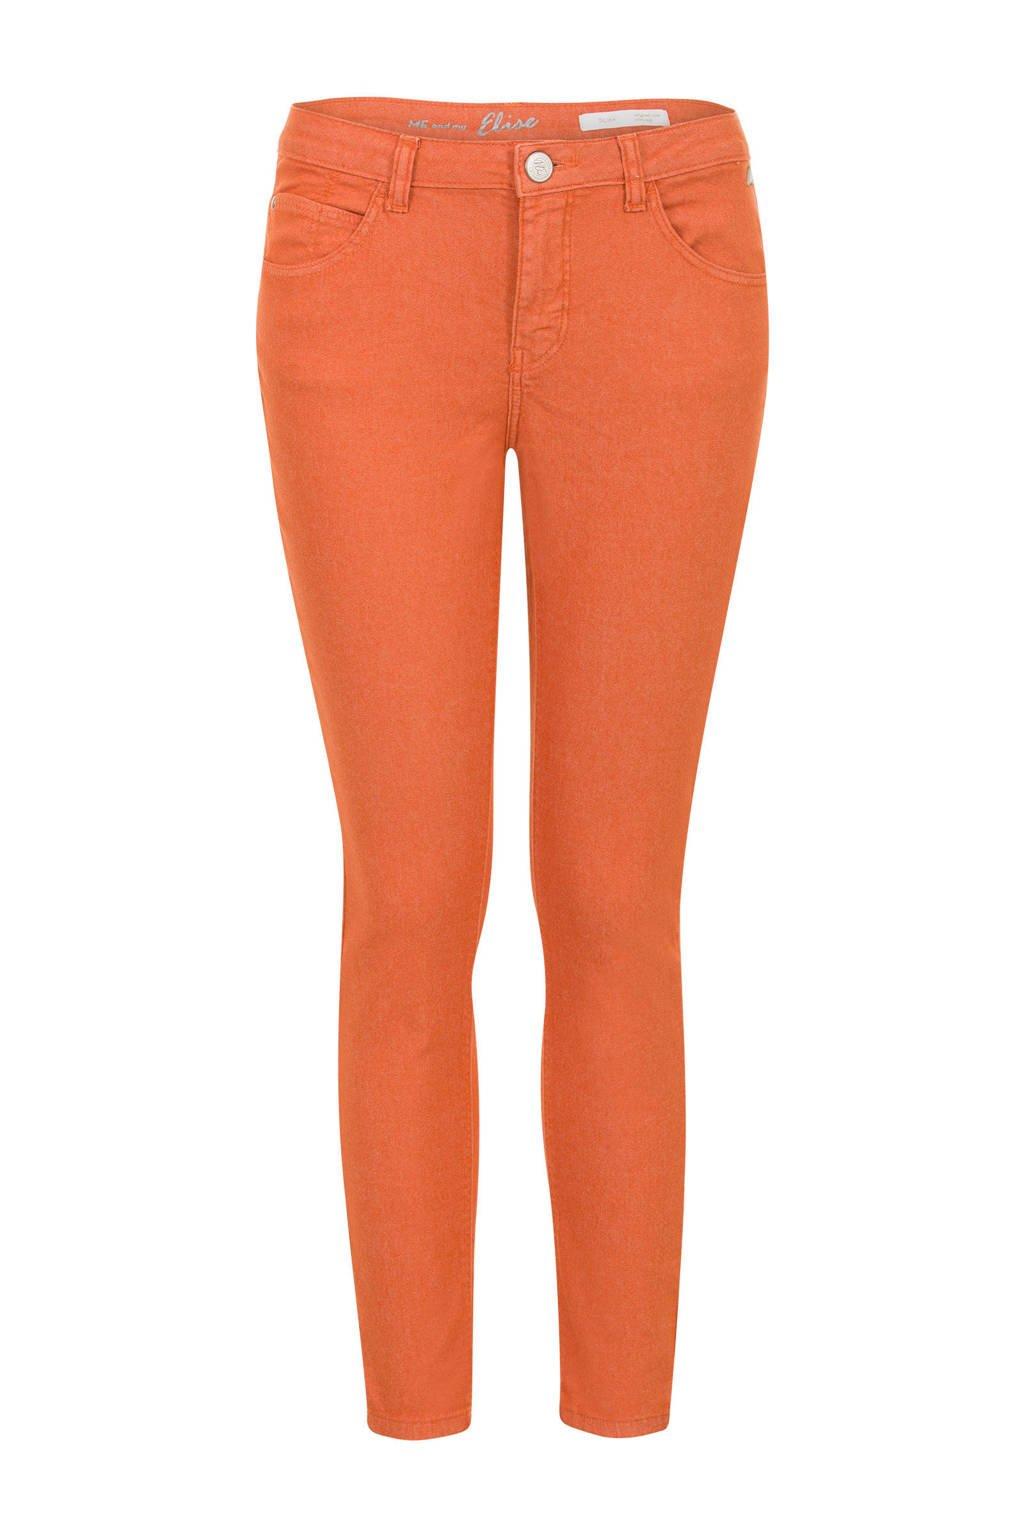 Miss Etam Regulier 5-pocket jeans oranje, Oranje